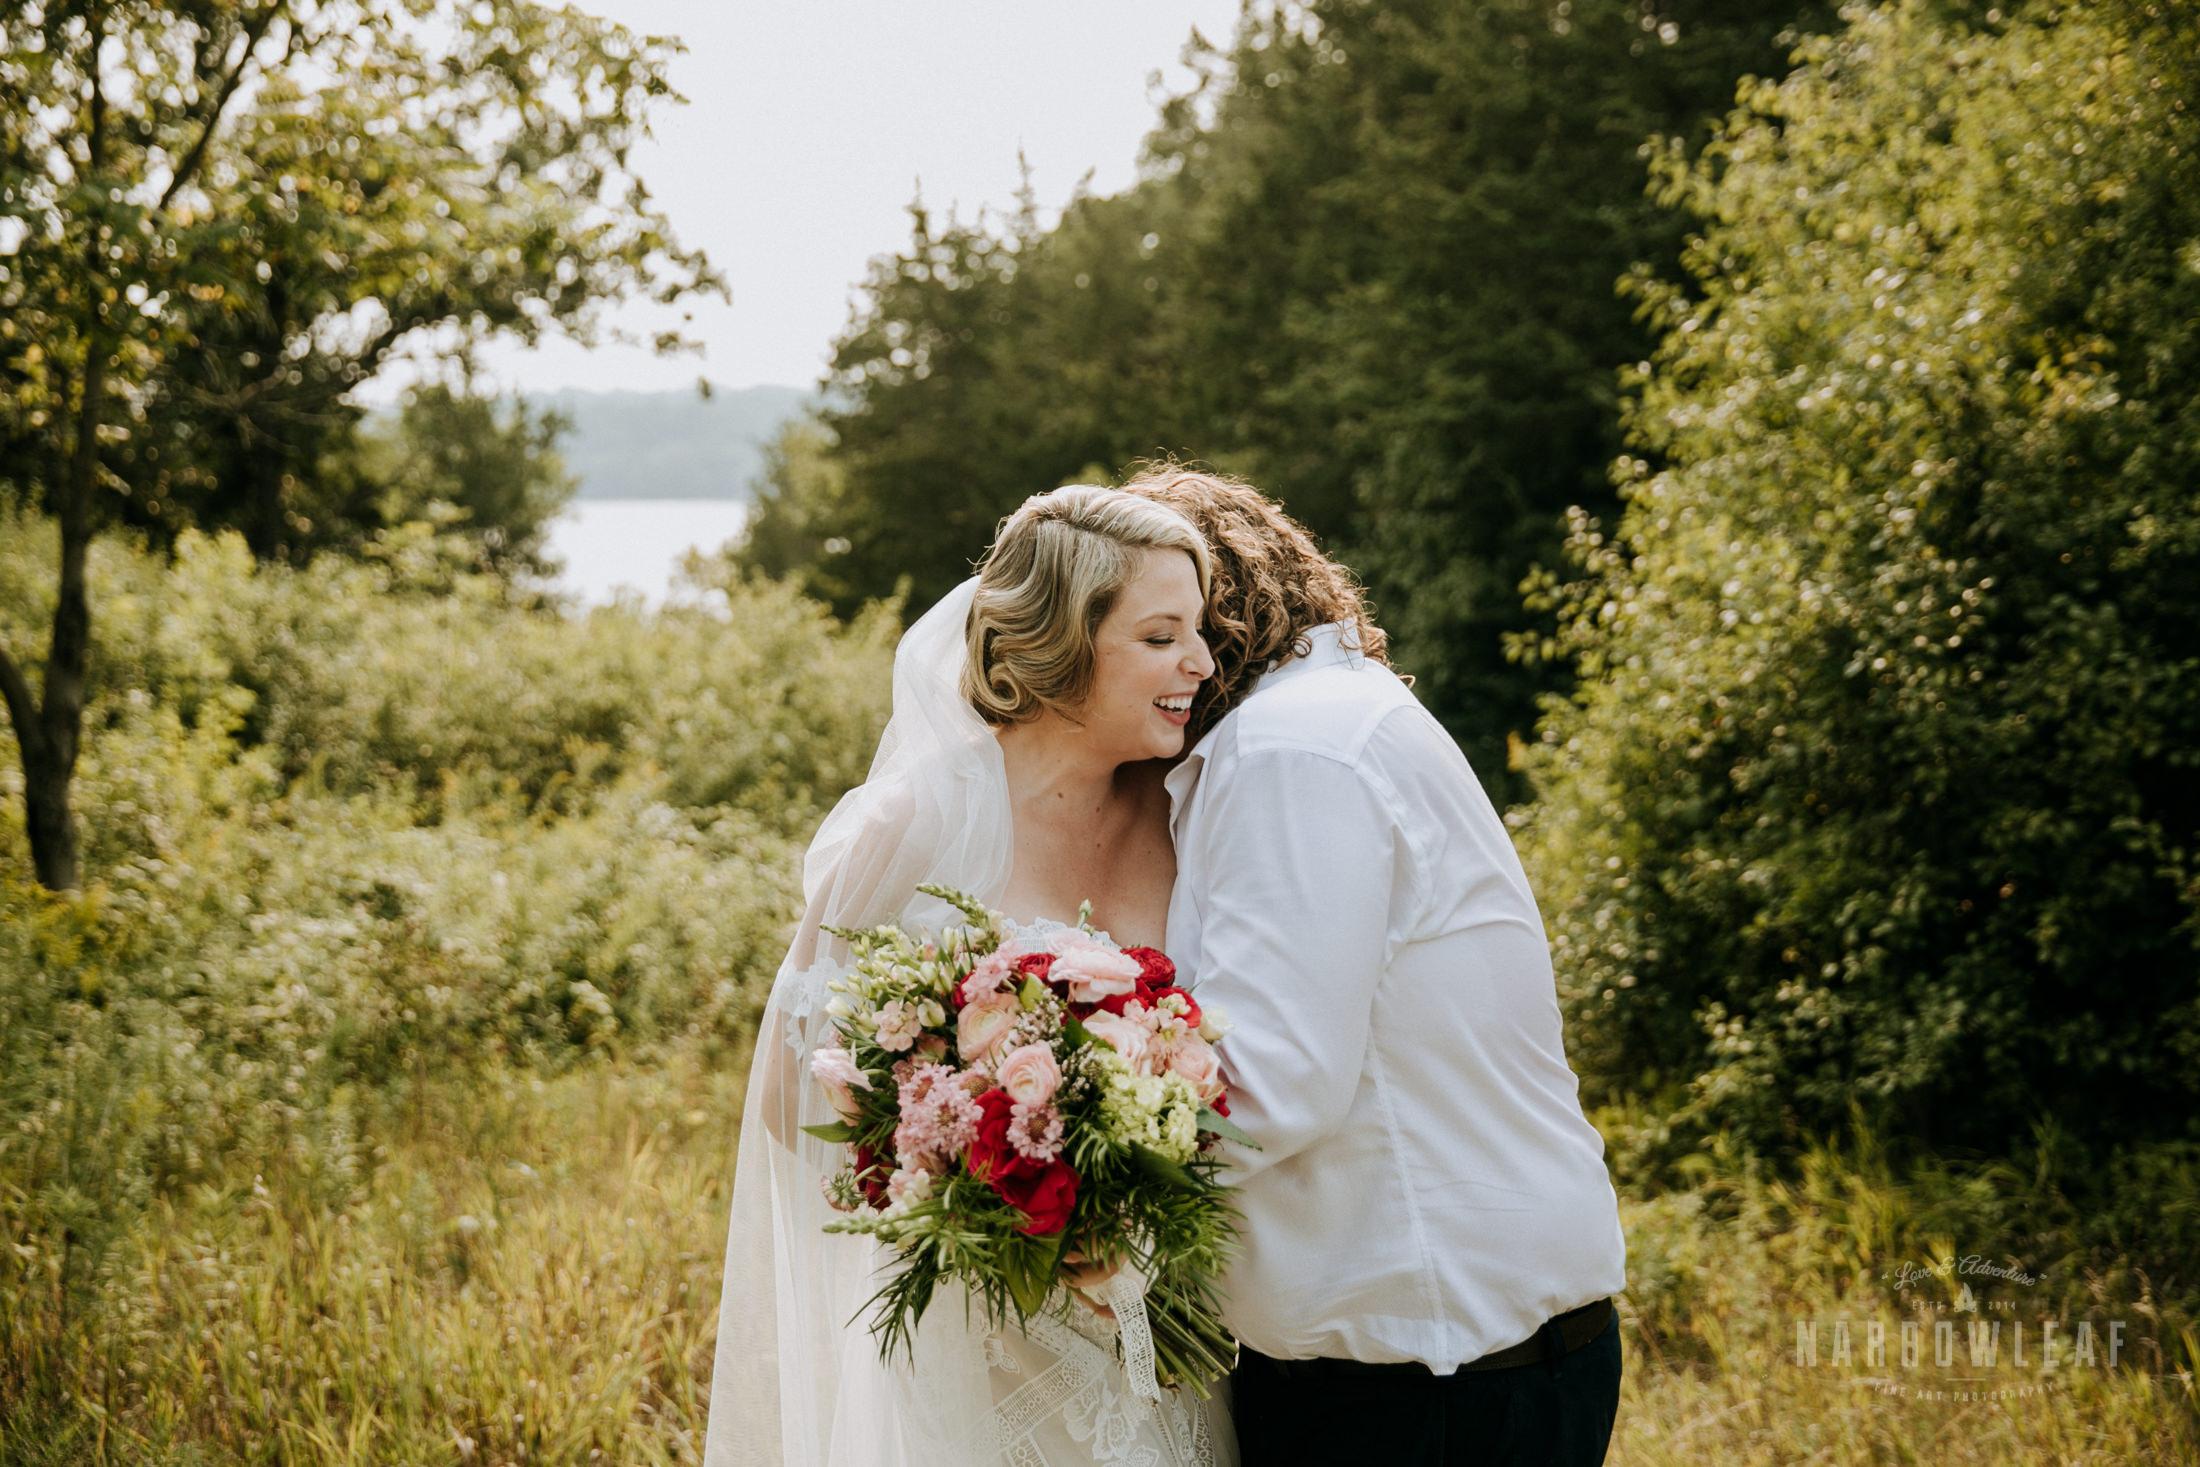 wisconsin-wedding-photographer-Narrowleaf_Love_and_Adventure_Photography-2868.jpg